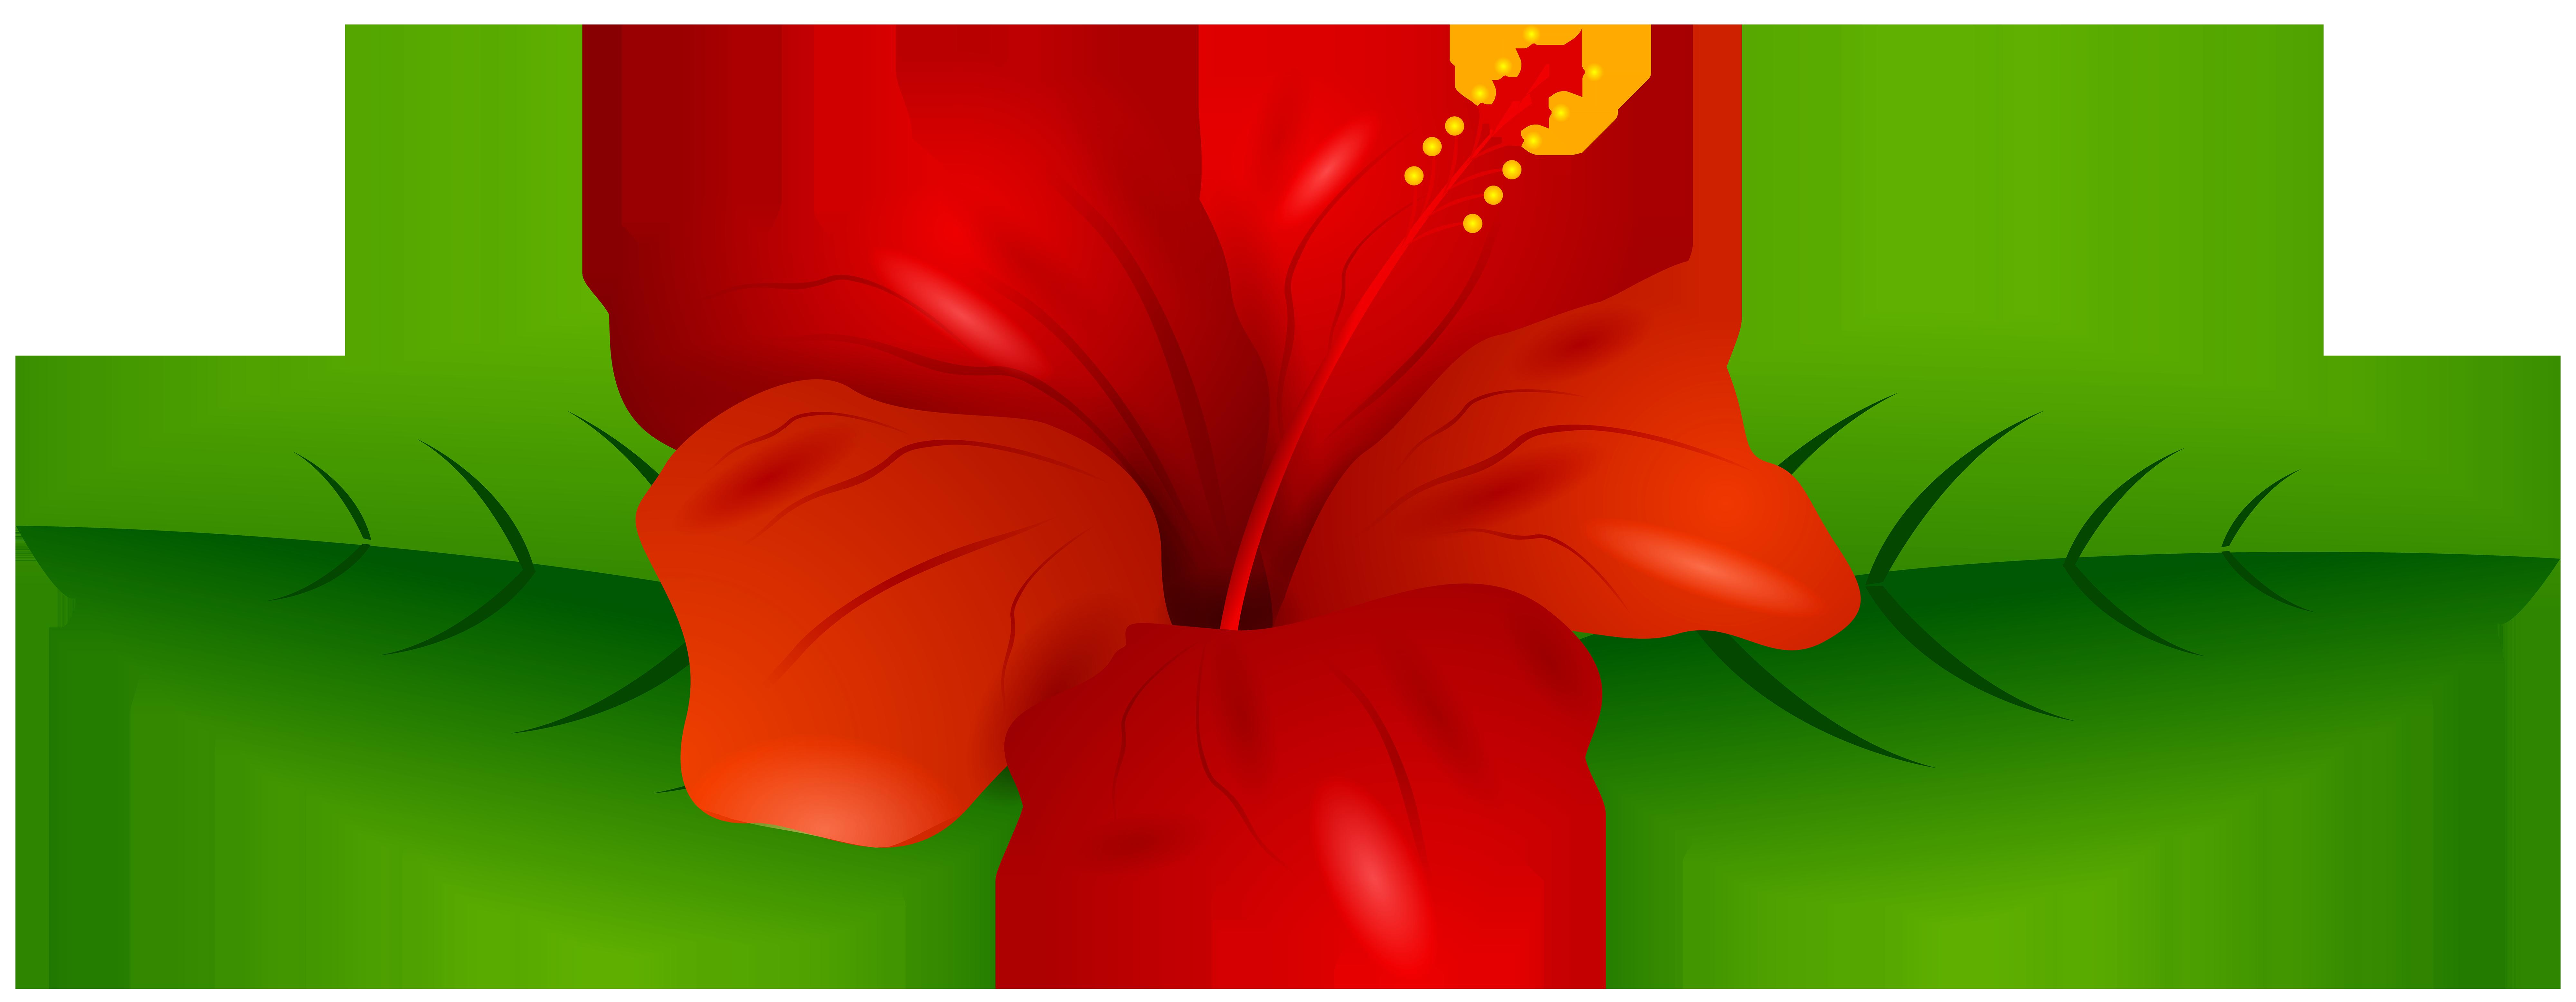 Red Hibiscus Transparent Png Clip Art Image Art Images Flower Art Clip Art